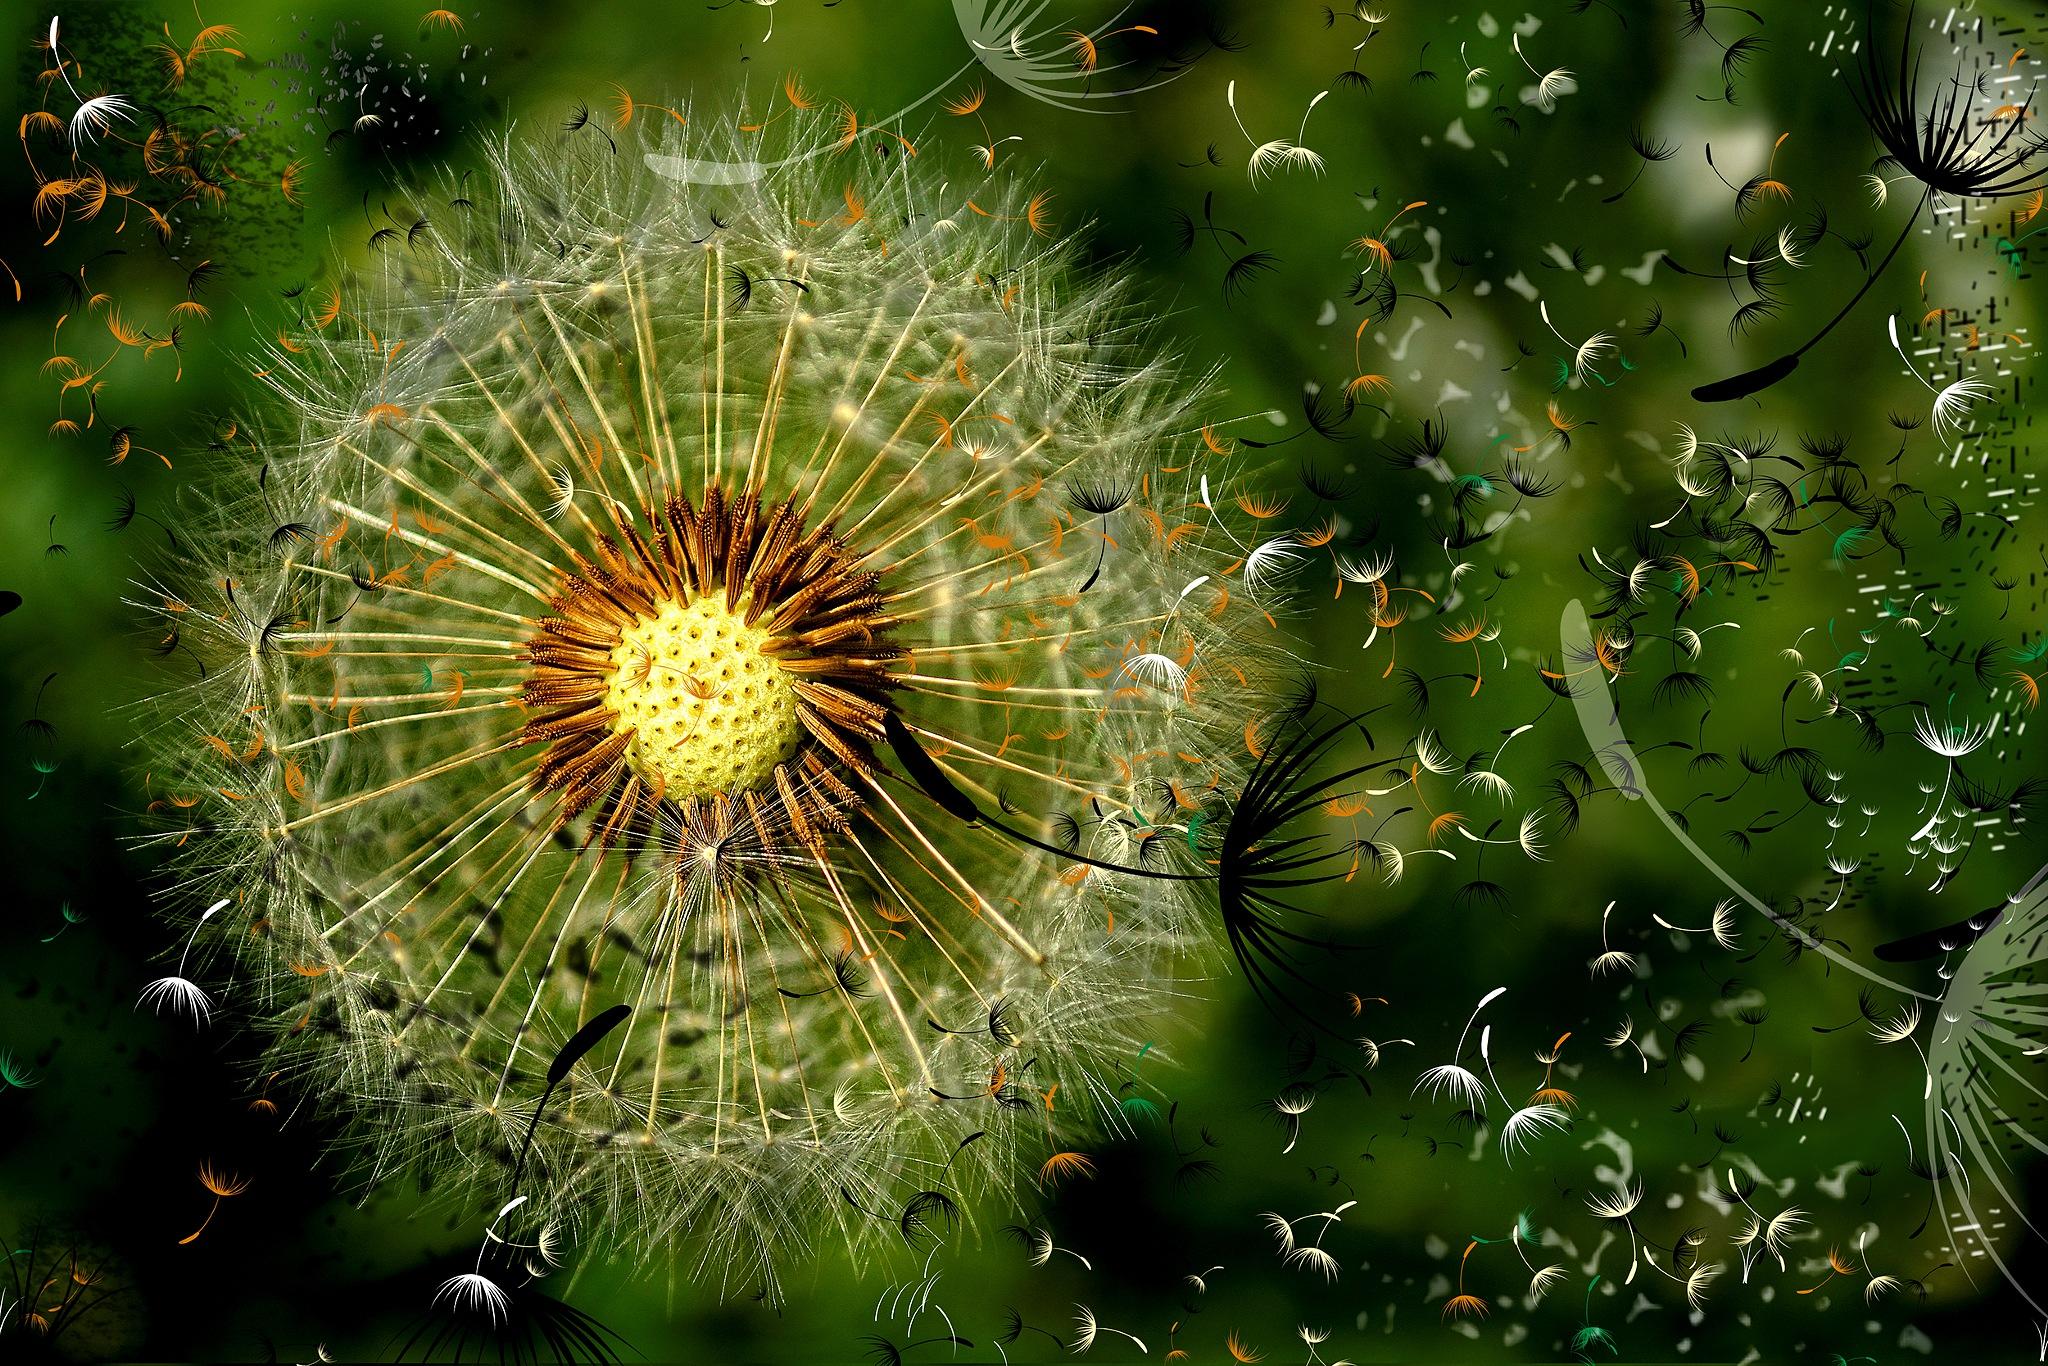 dandelion art by Cor de Keijzer